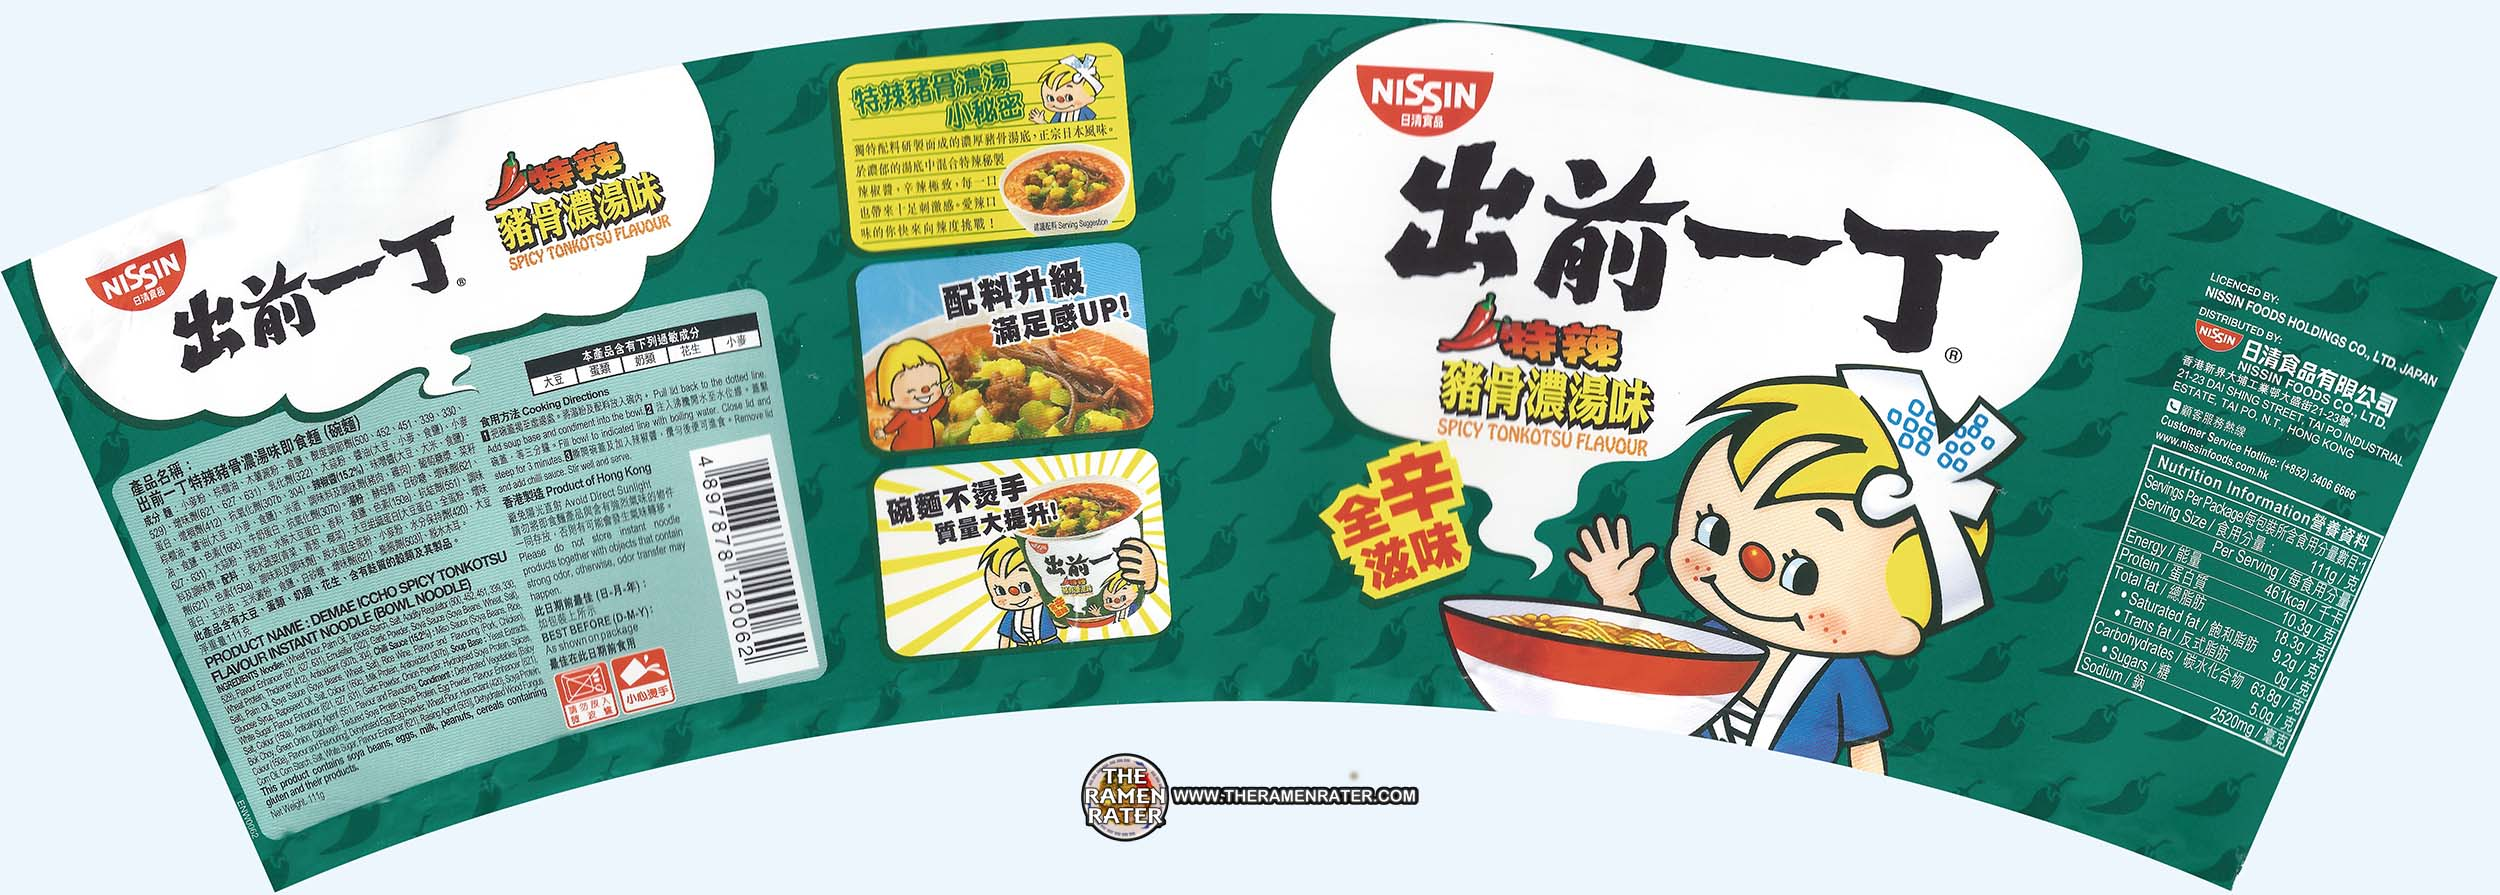 2279: Nissin Demae Iccho Spicy Tonkotsu Flavour Instant Noodle - The ...